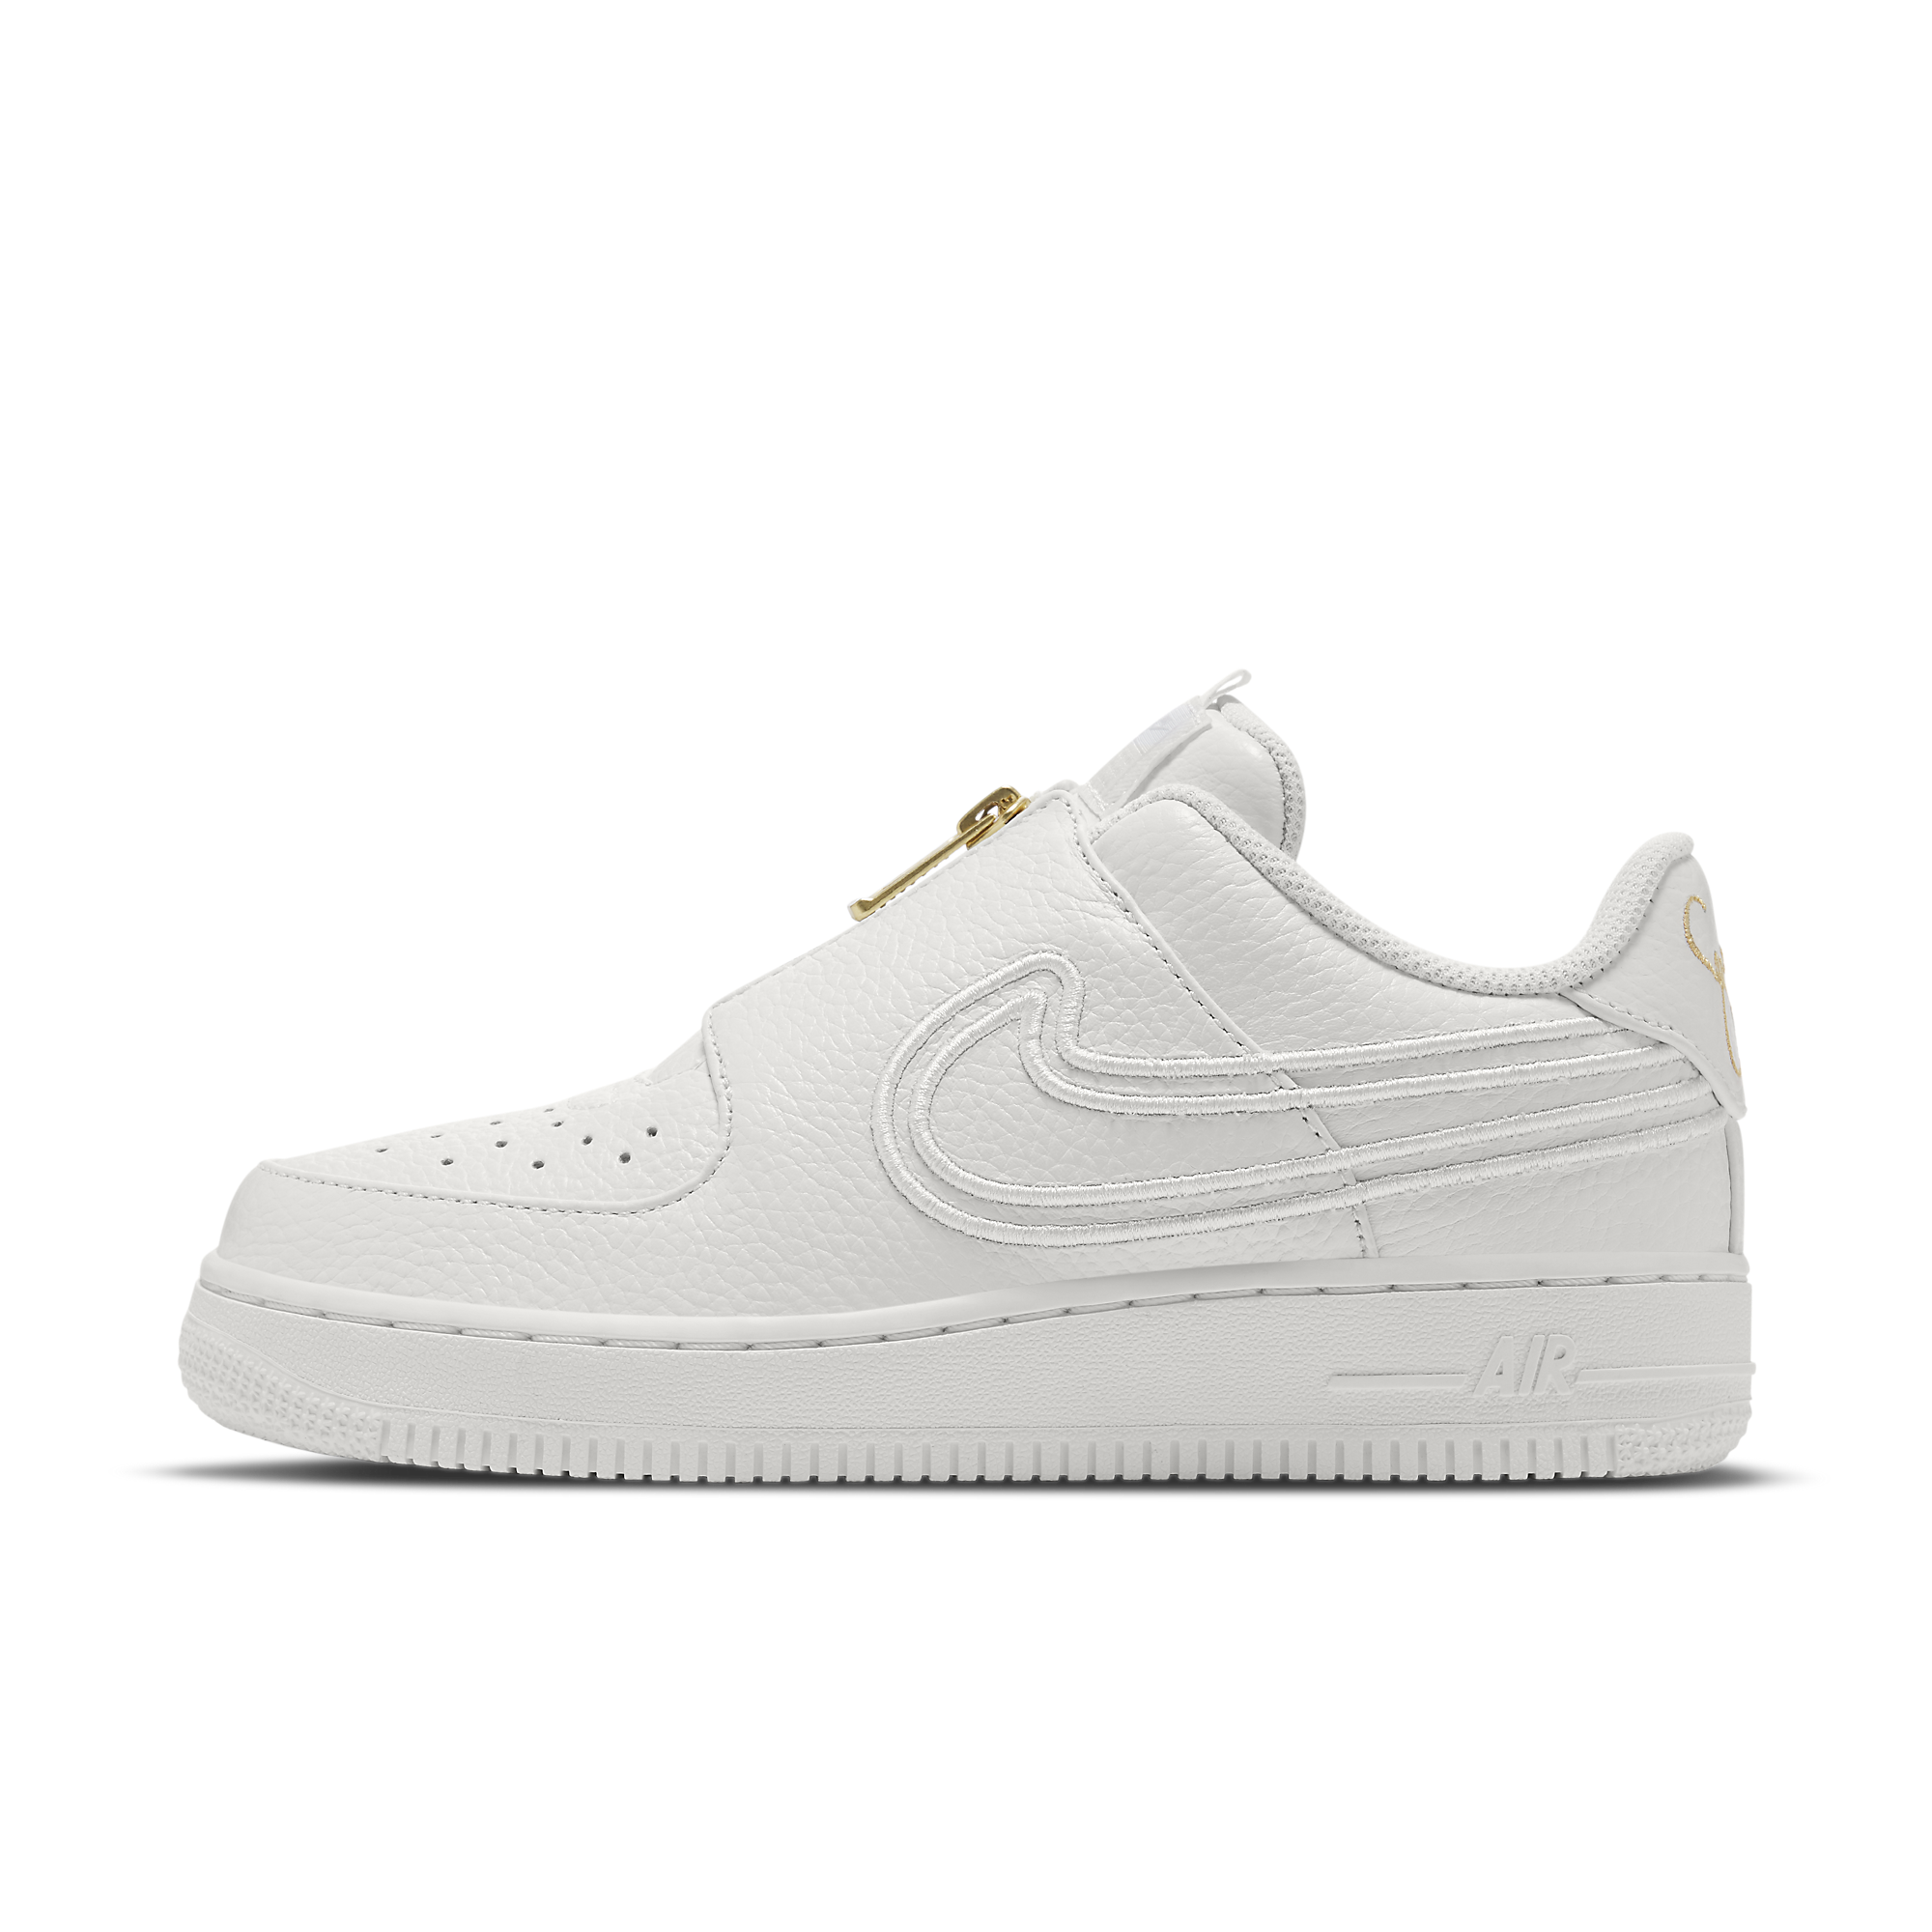 Nike Air Force 1 LXX Serena Williams